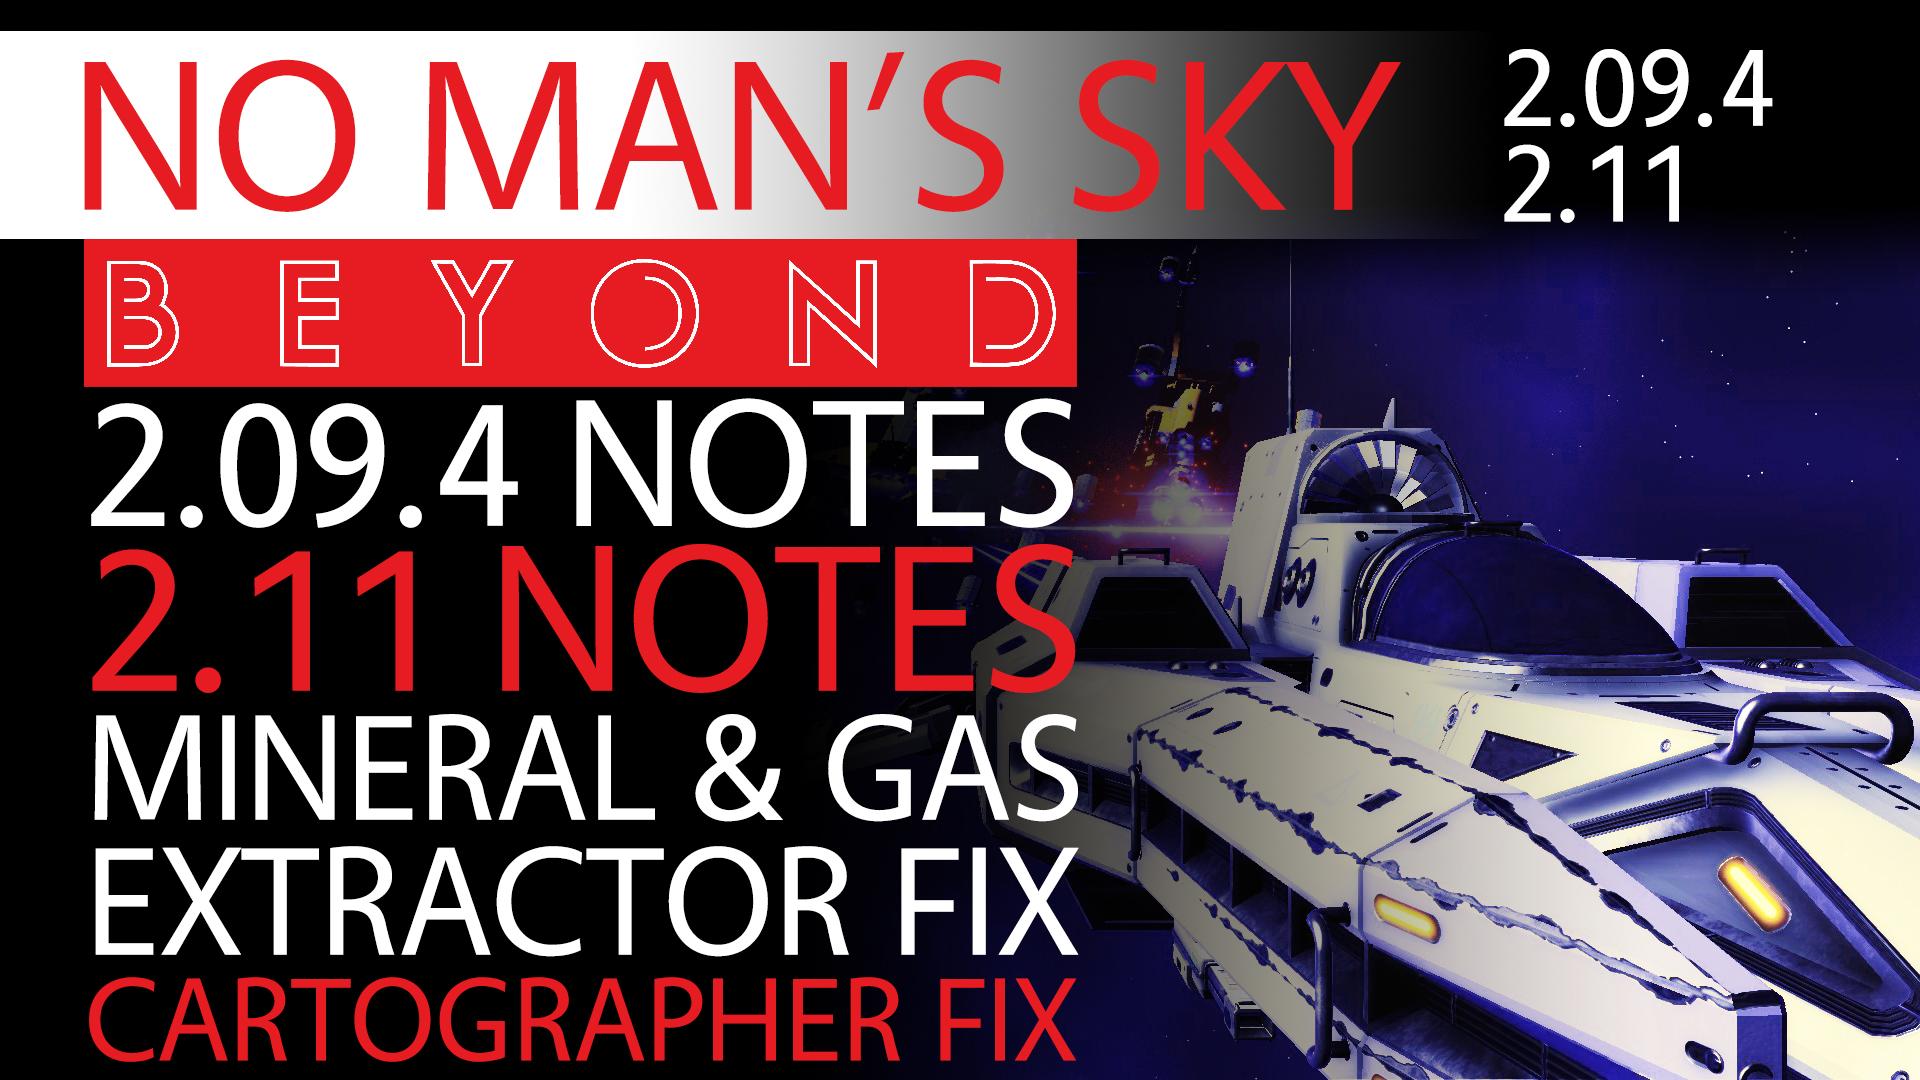 No Man's Sky Beyond News 2.09.4 & 2.09.5 Patch Notes - Extractor Fix, Cartographer Navigation Data+